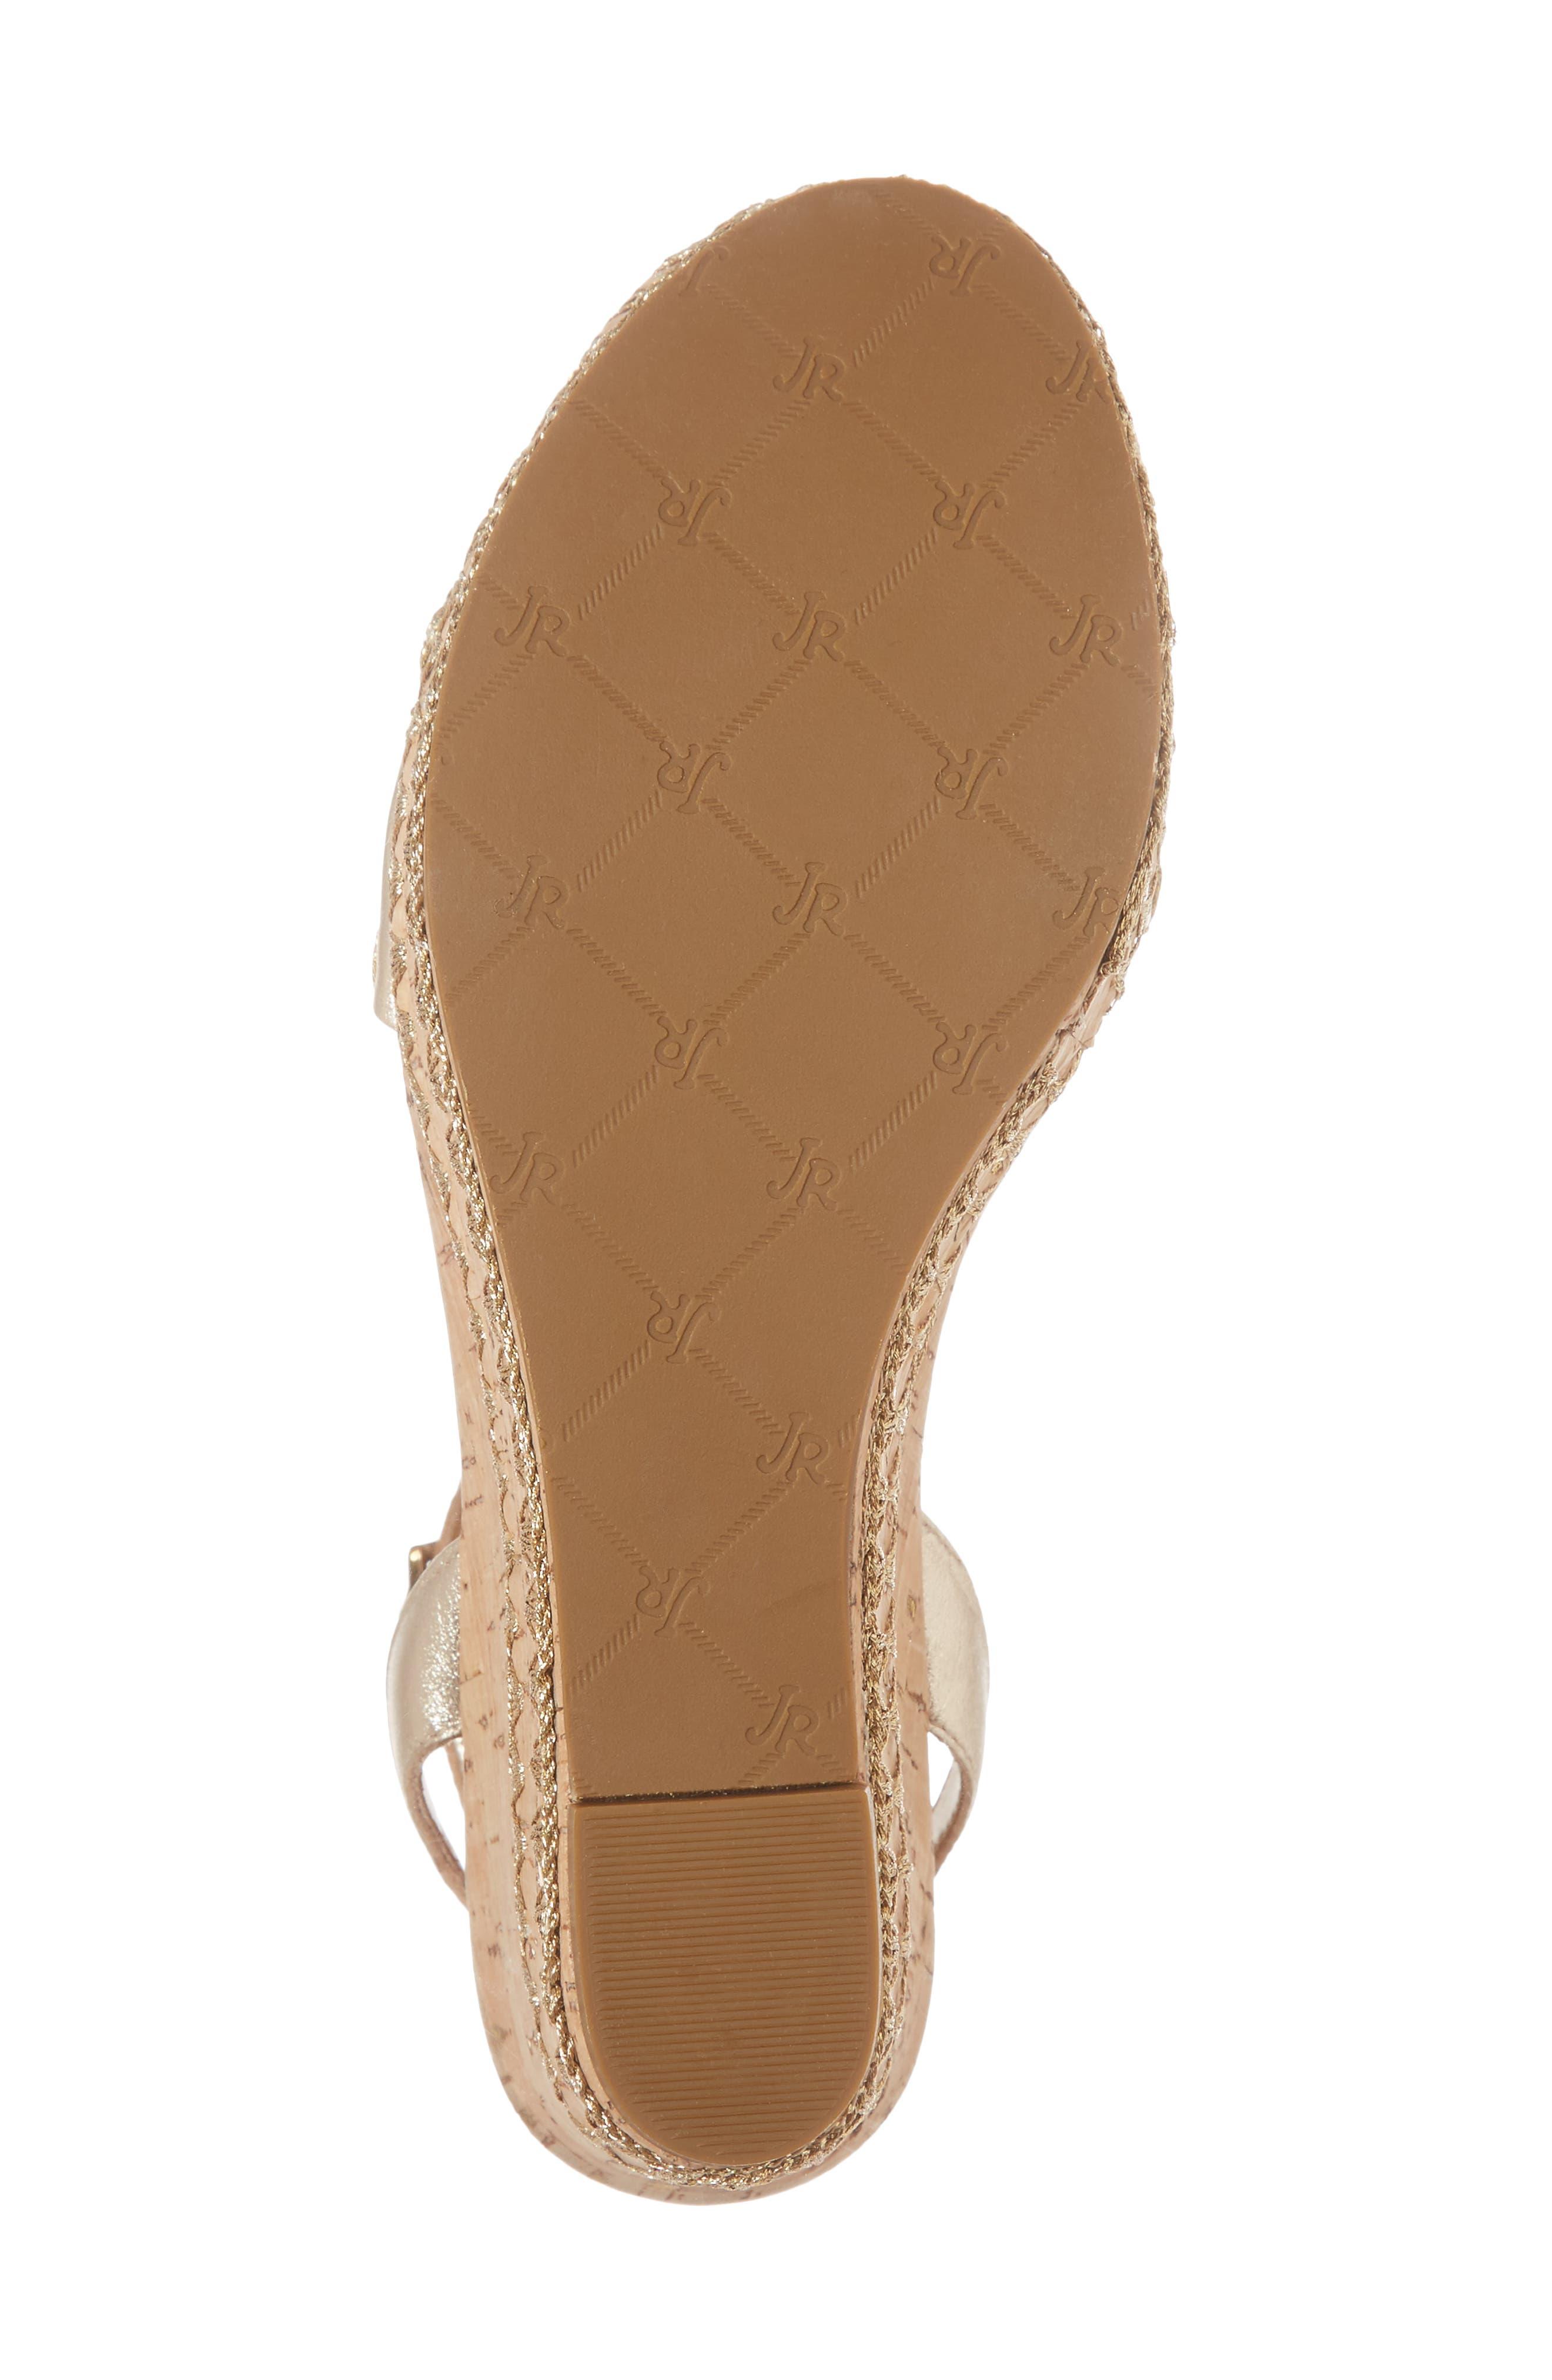 Lennon Platform Wedge Sandal,                             Alternate thumbnail 6, color,                             Platinum Leather